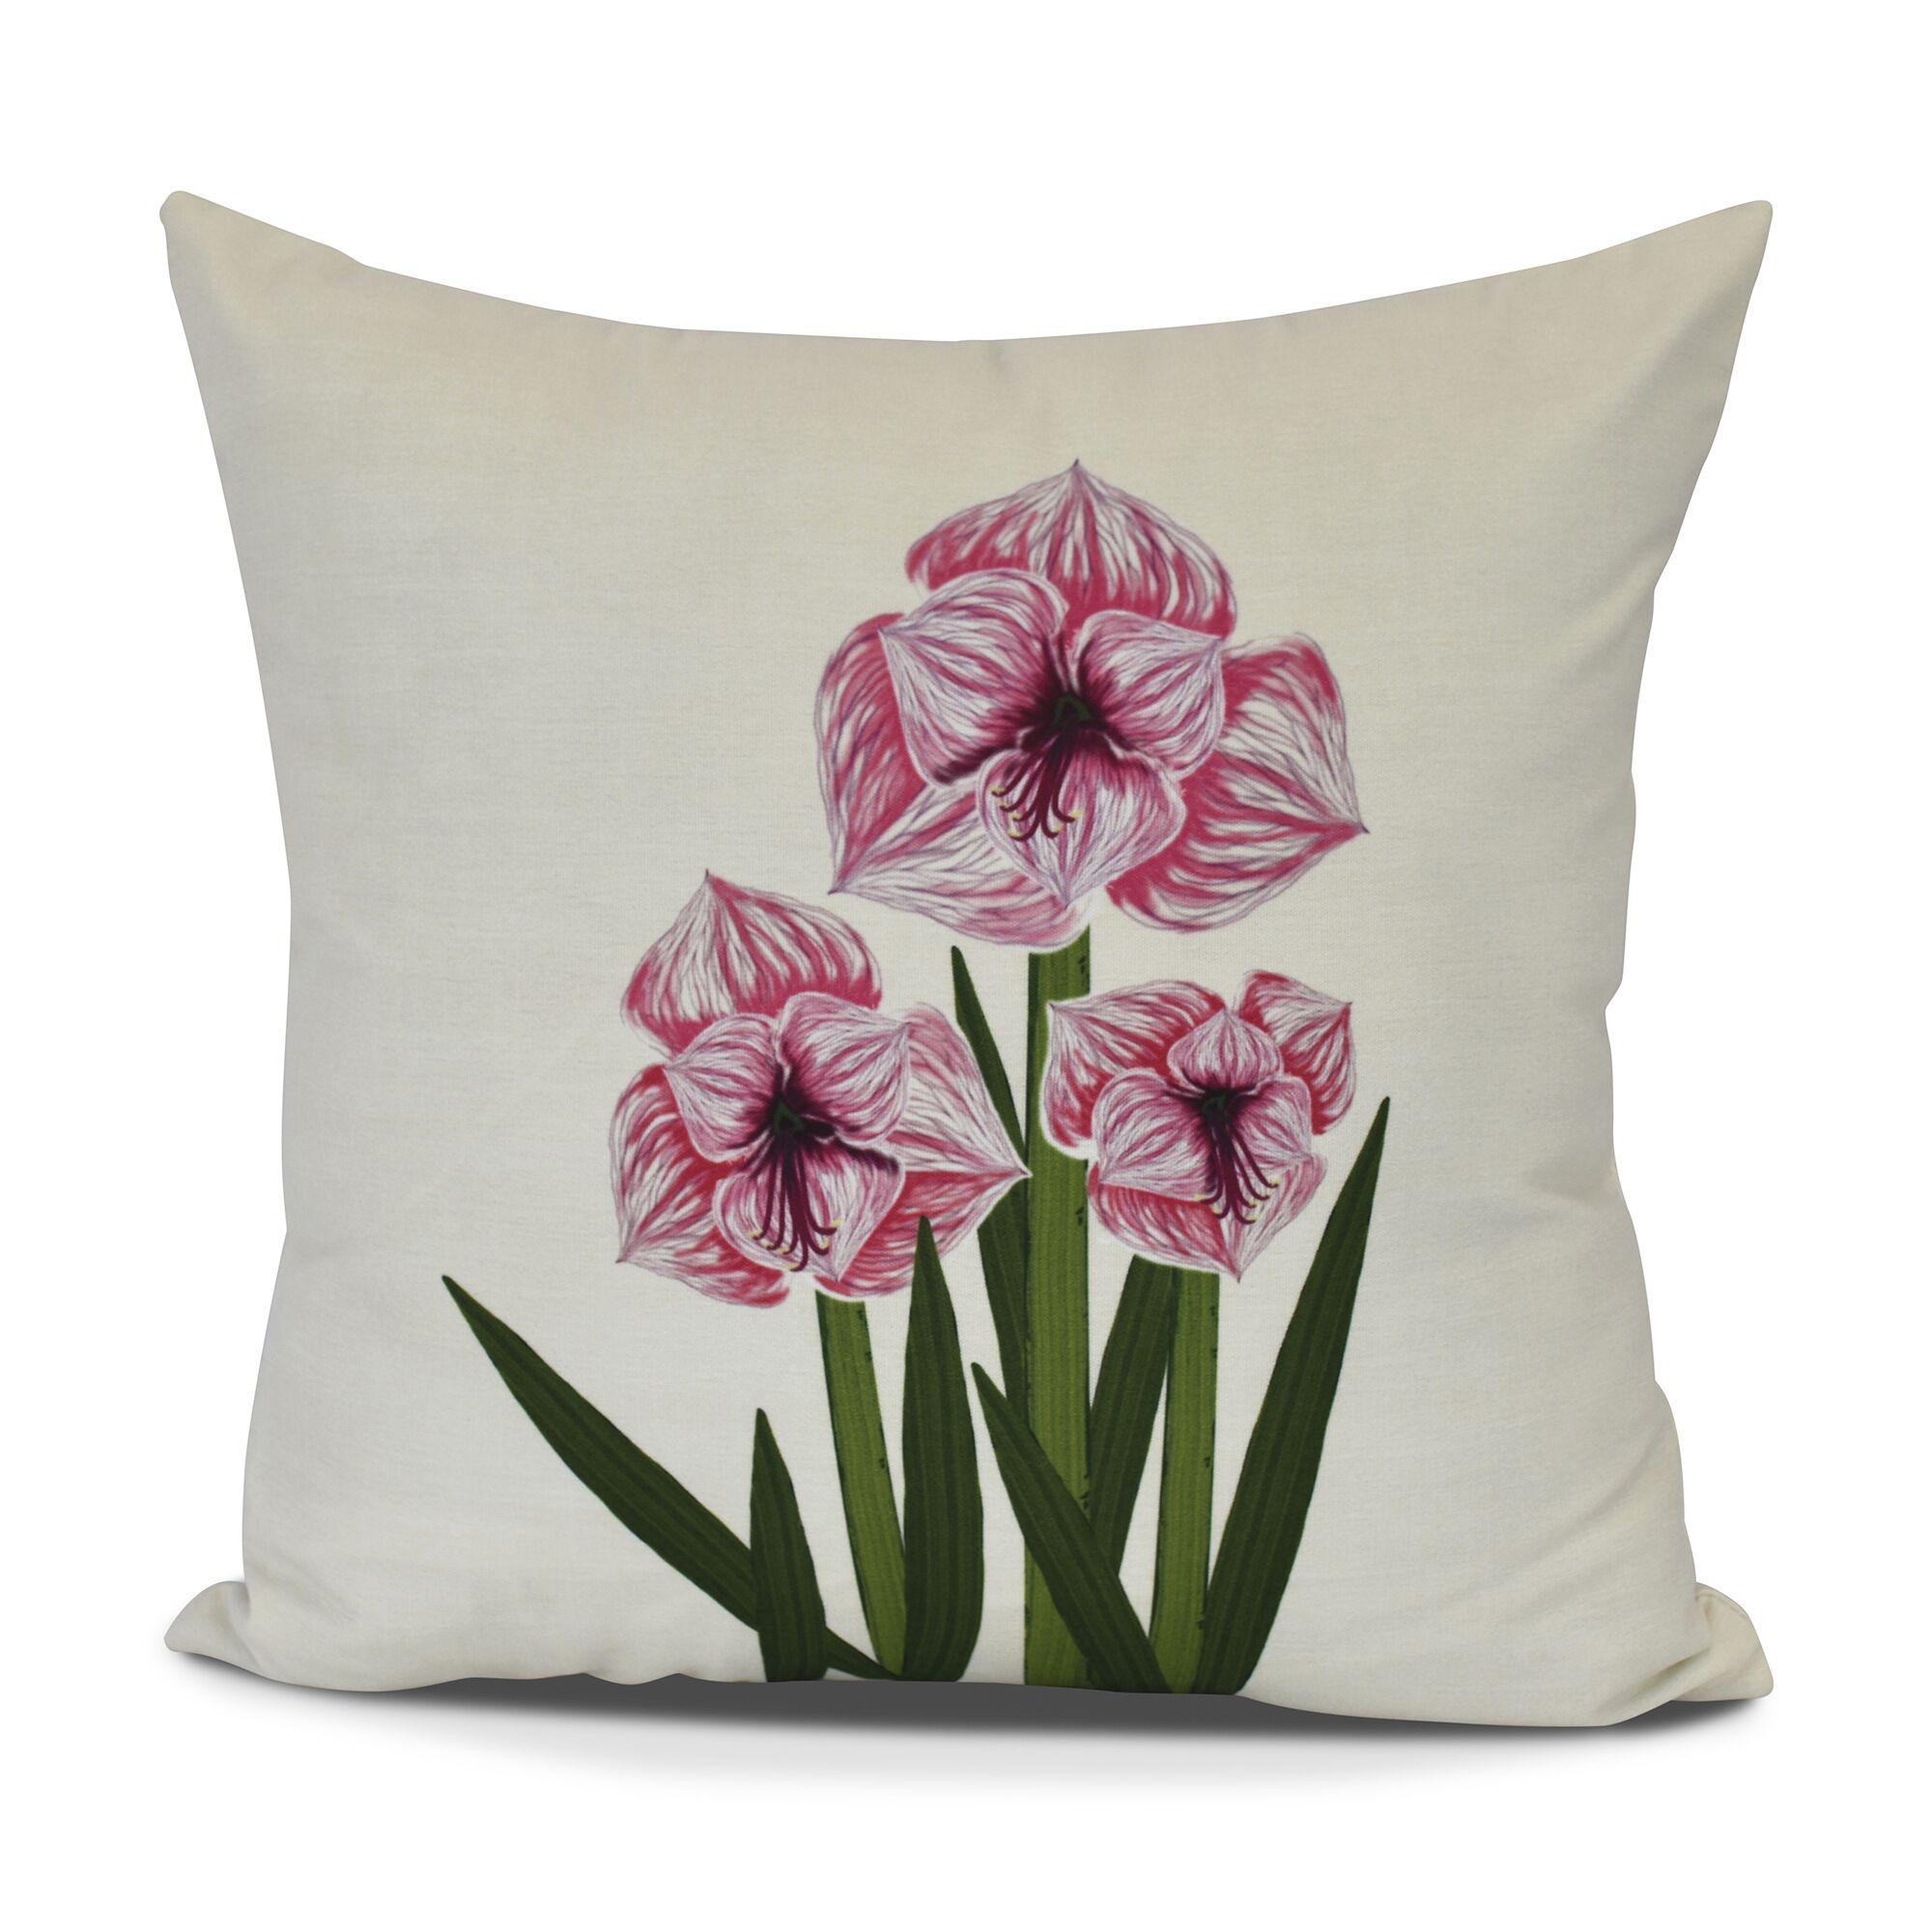 Amanda Amaryllis Floral Print Throw Pillow Size: 16